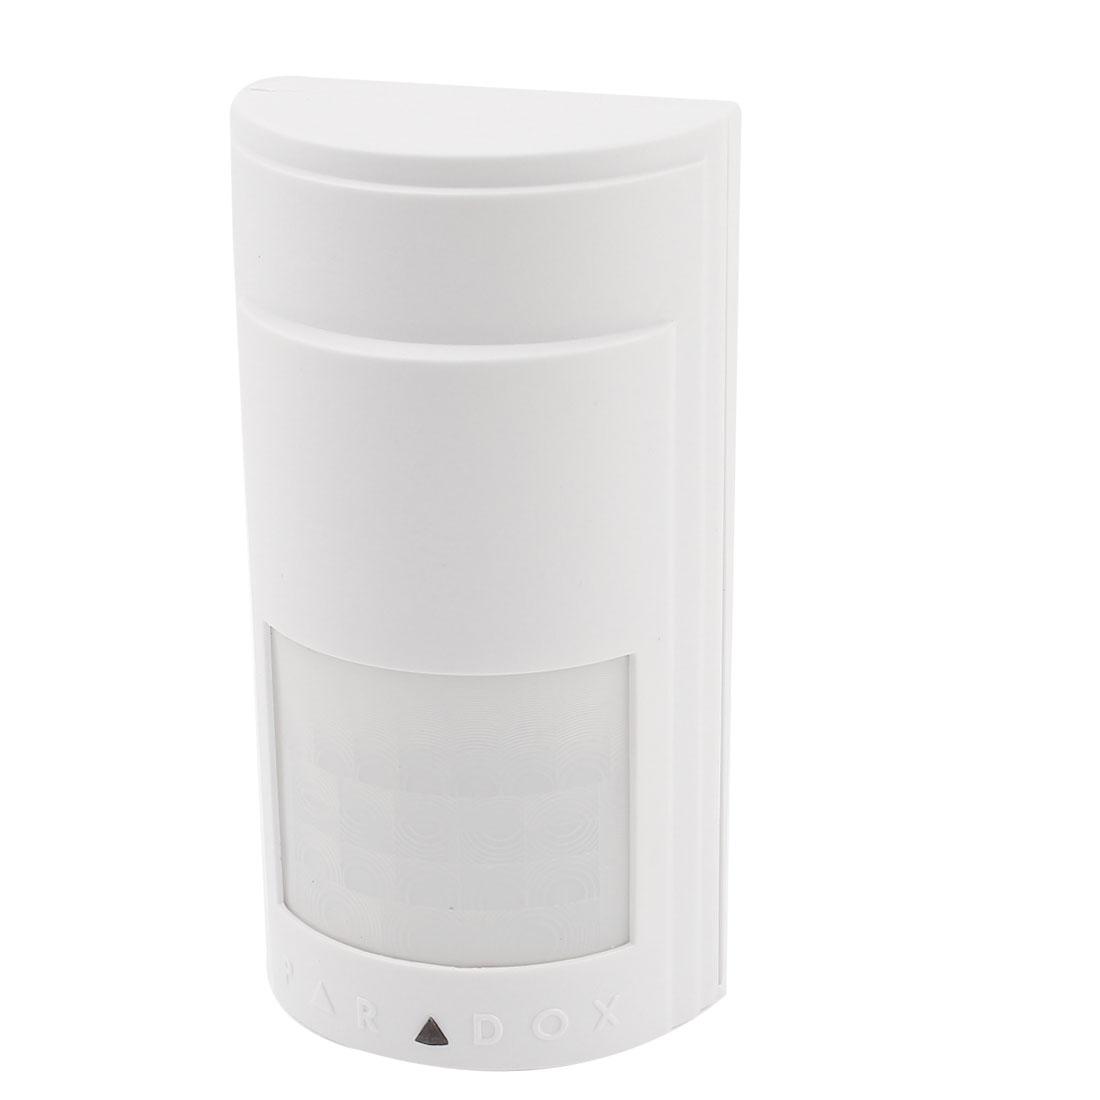 90 Degree 12M x 12M Security Passive IR Sensor Detector PIR Alarm DC10-16V